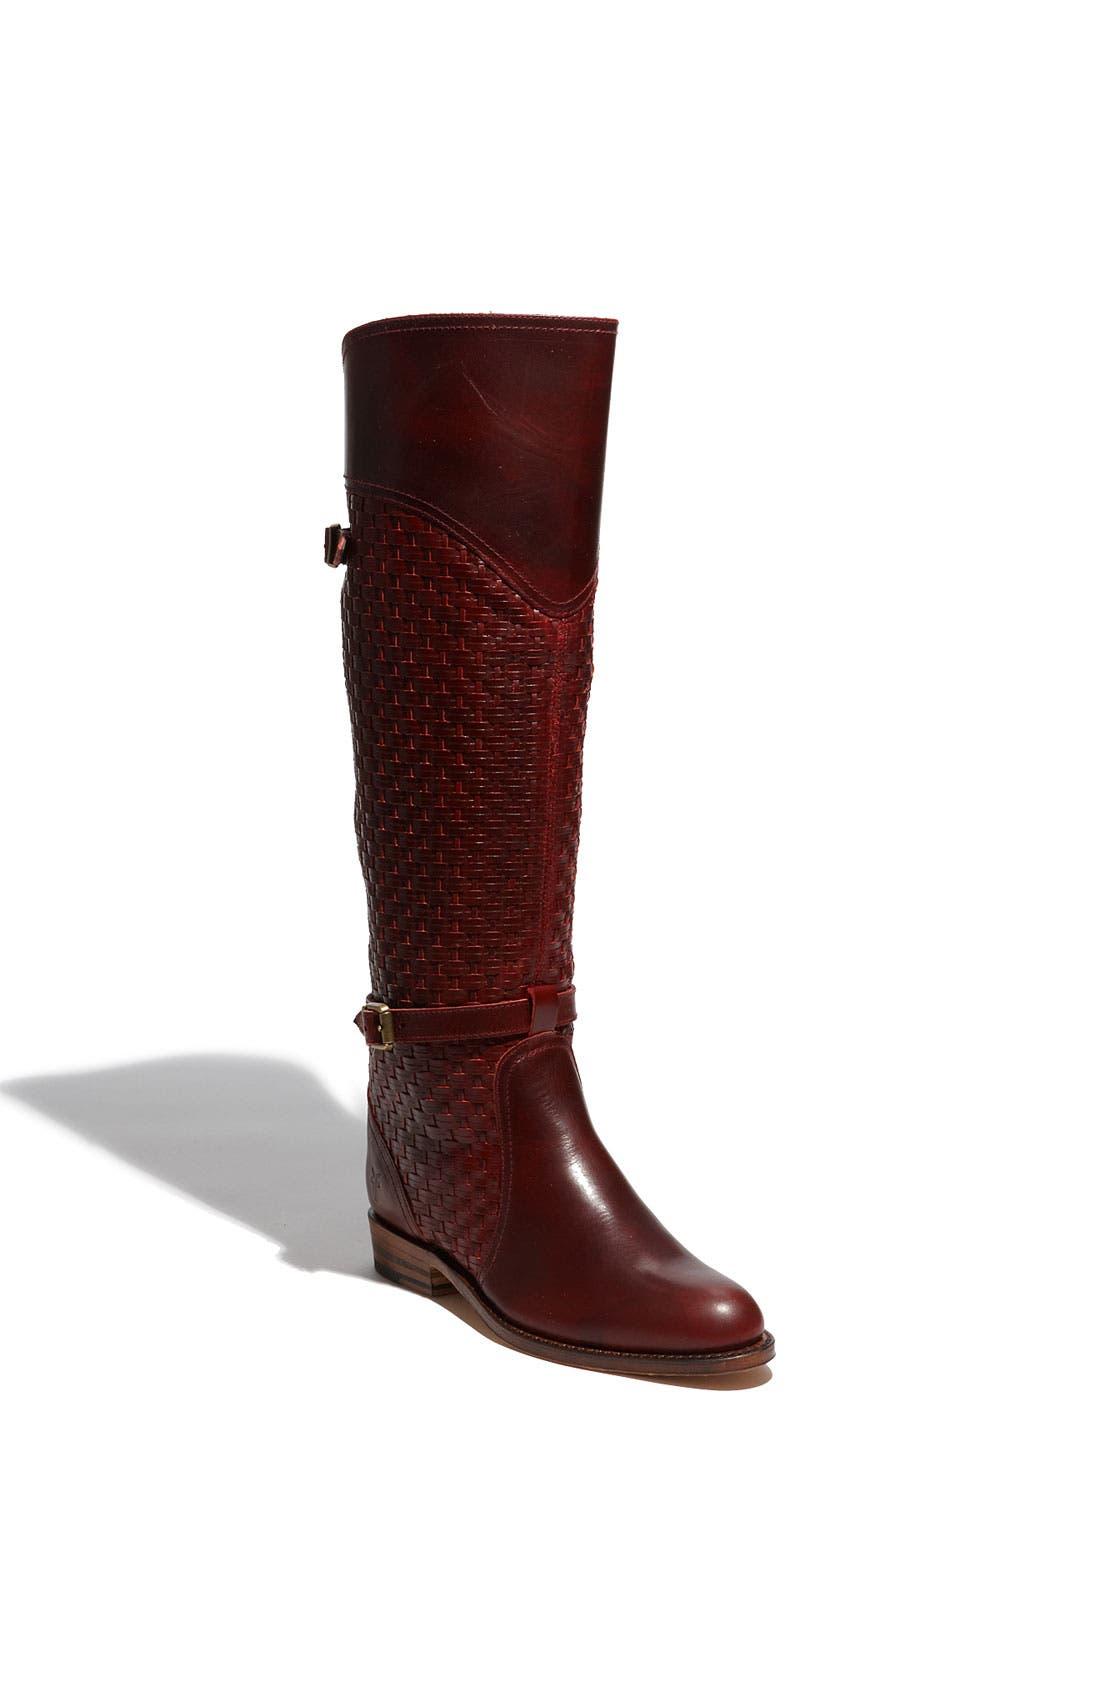 Alternate Image 1 Selected - Frye 'Dorado' Riding Boot